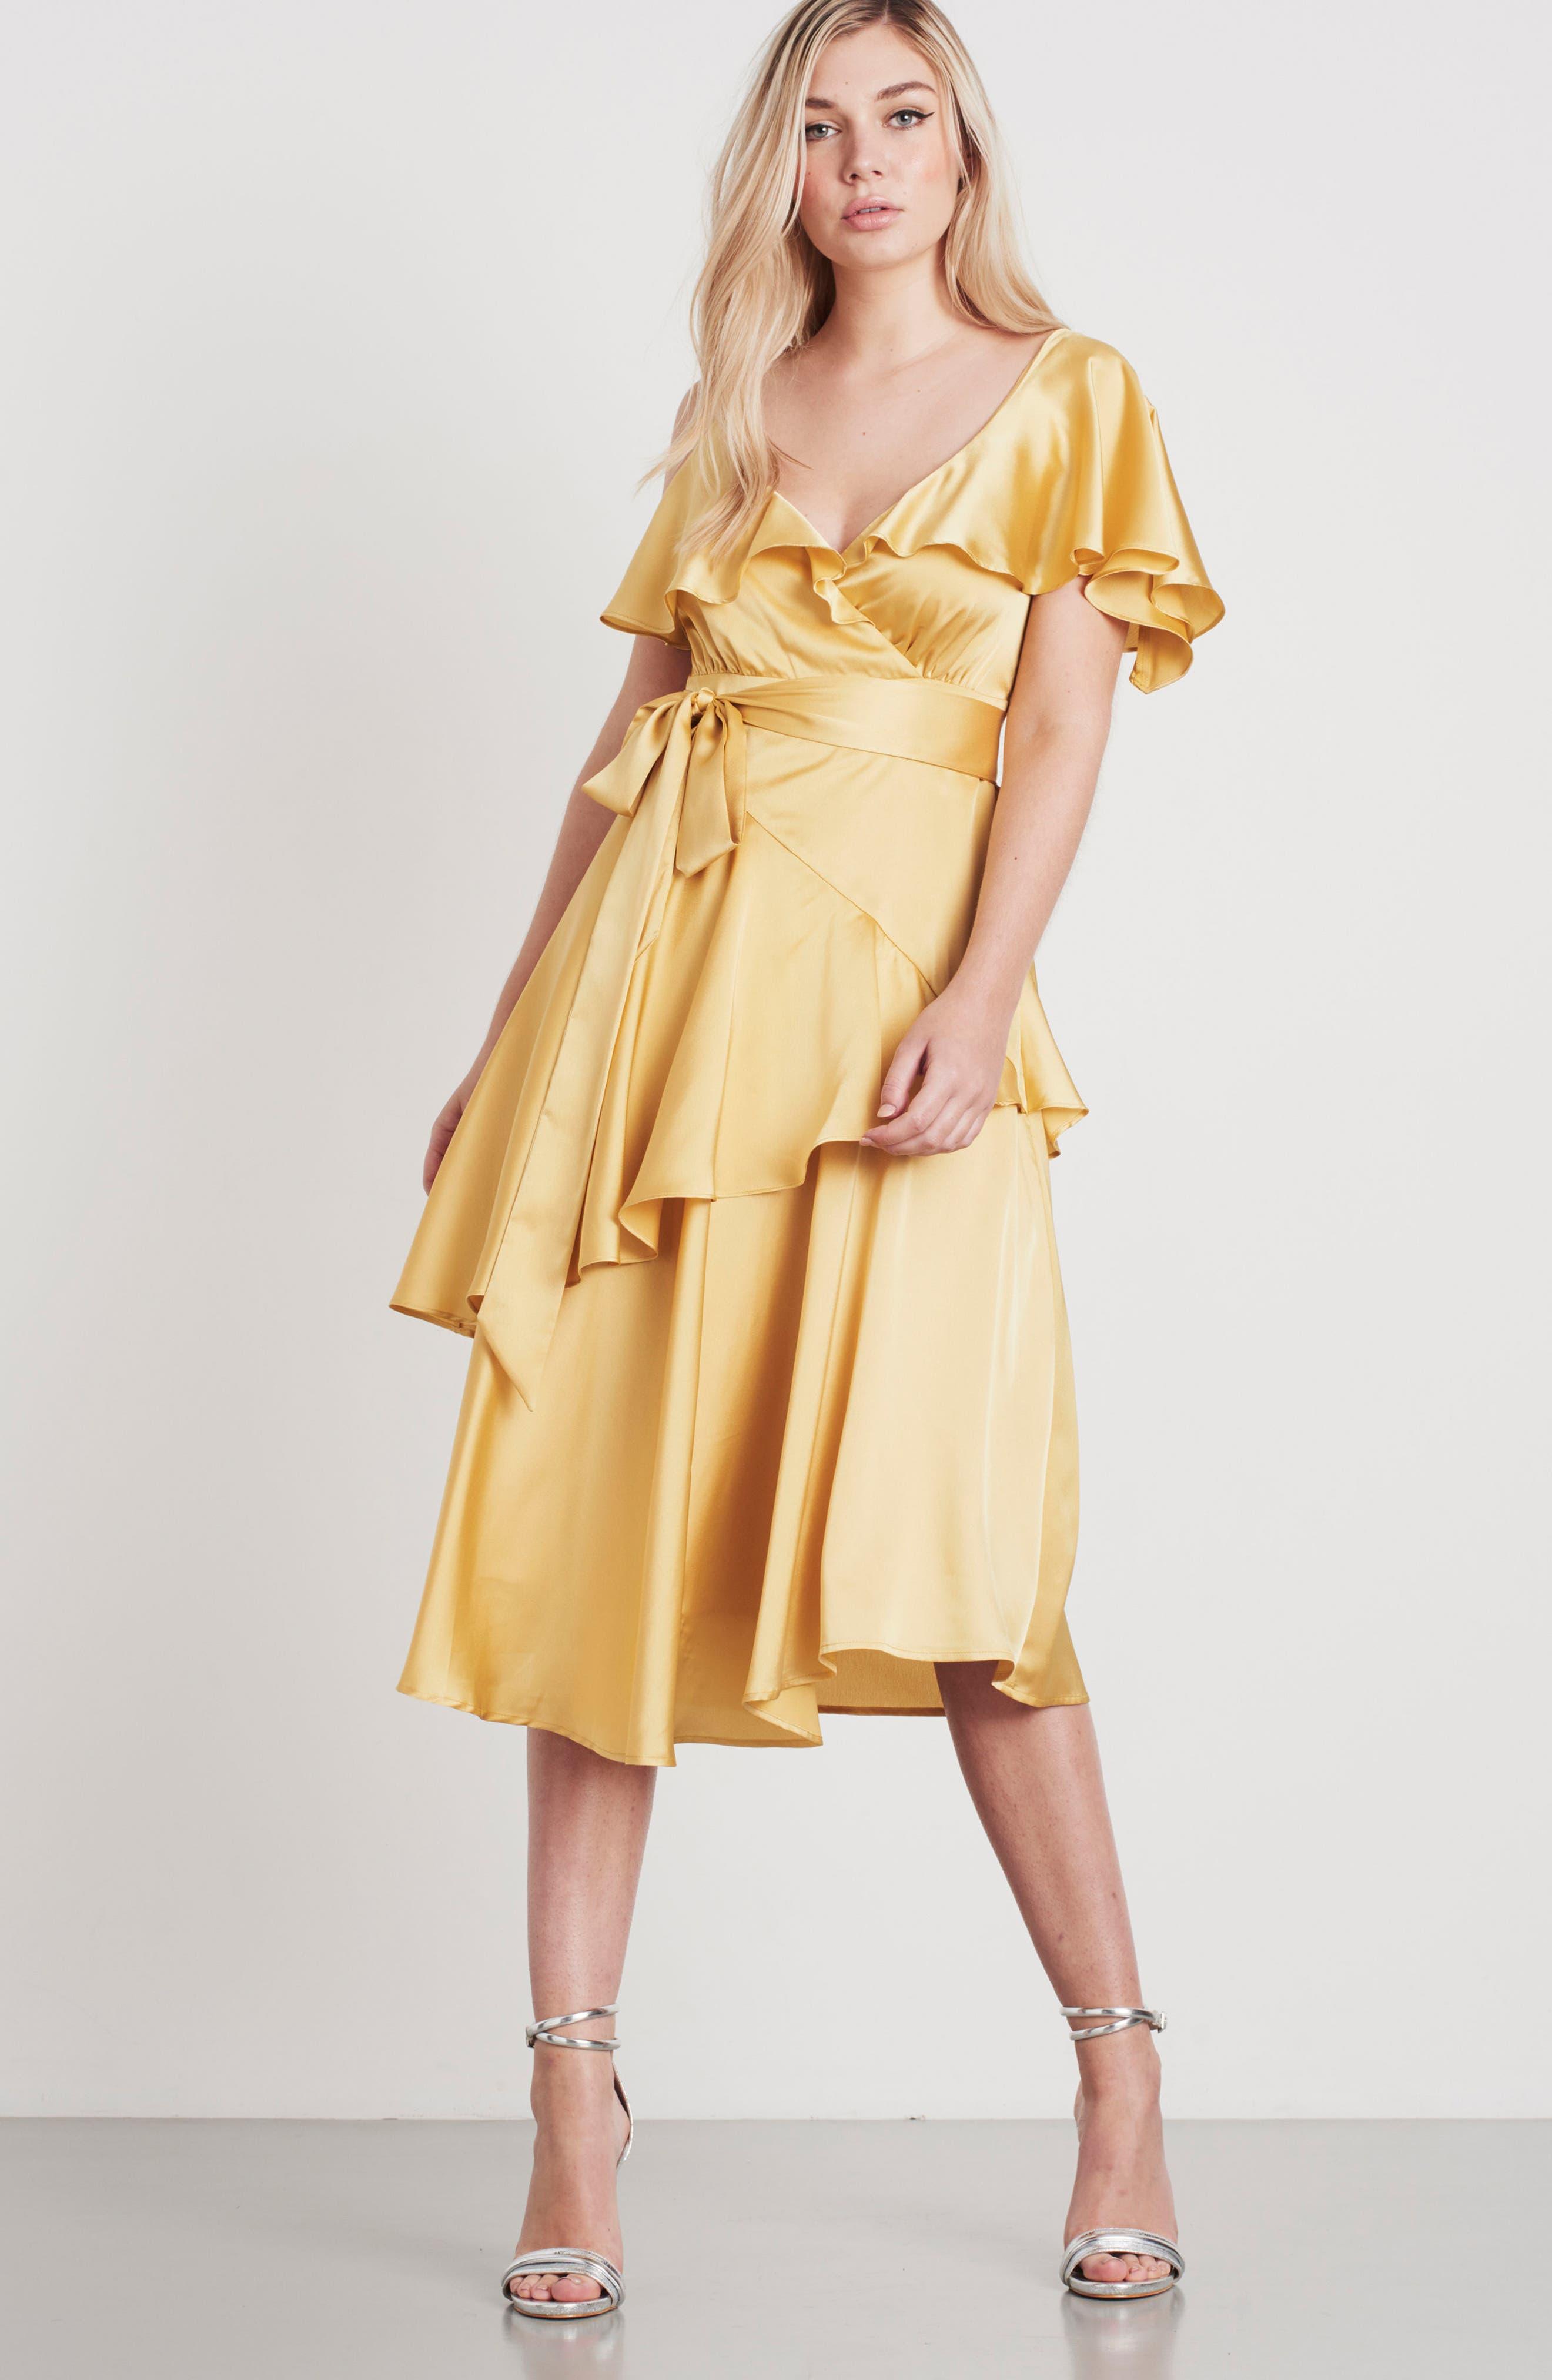 Deconstructed Tea Dress,                             Alternate thumbnail 2, color,                             Yellow